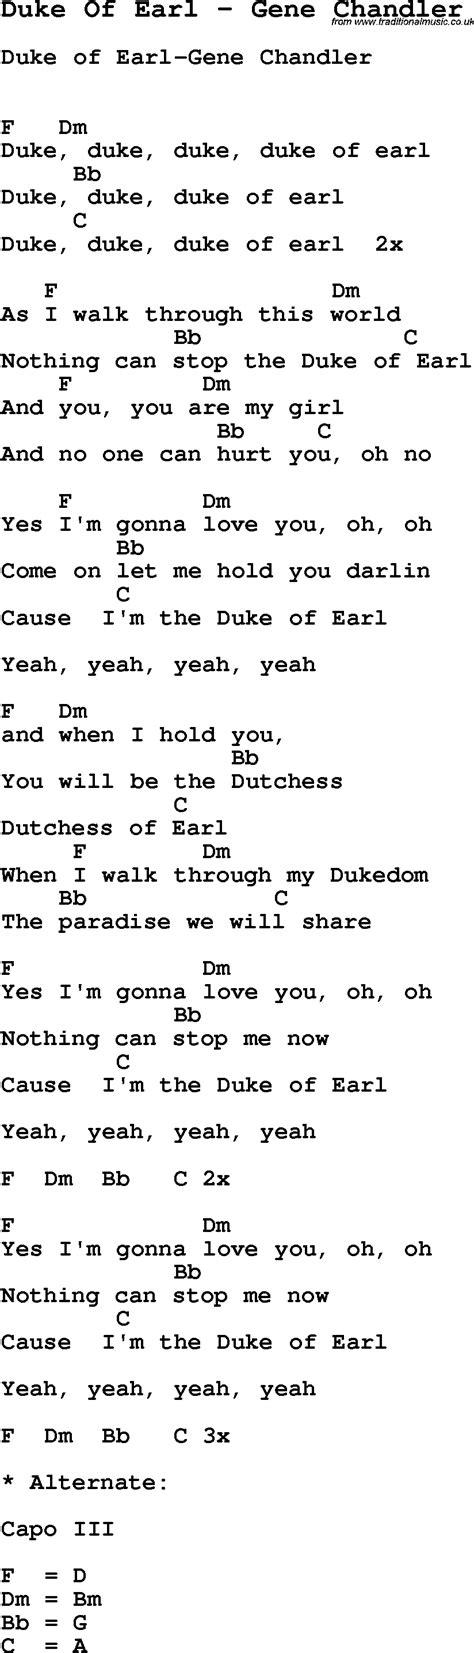 s day lyrics earle song duke of earl by gene chandler song lyric for vocal